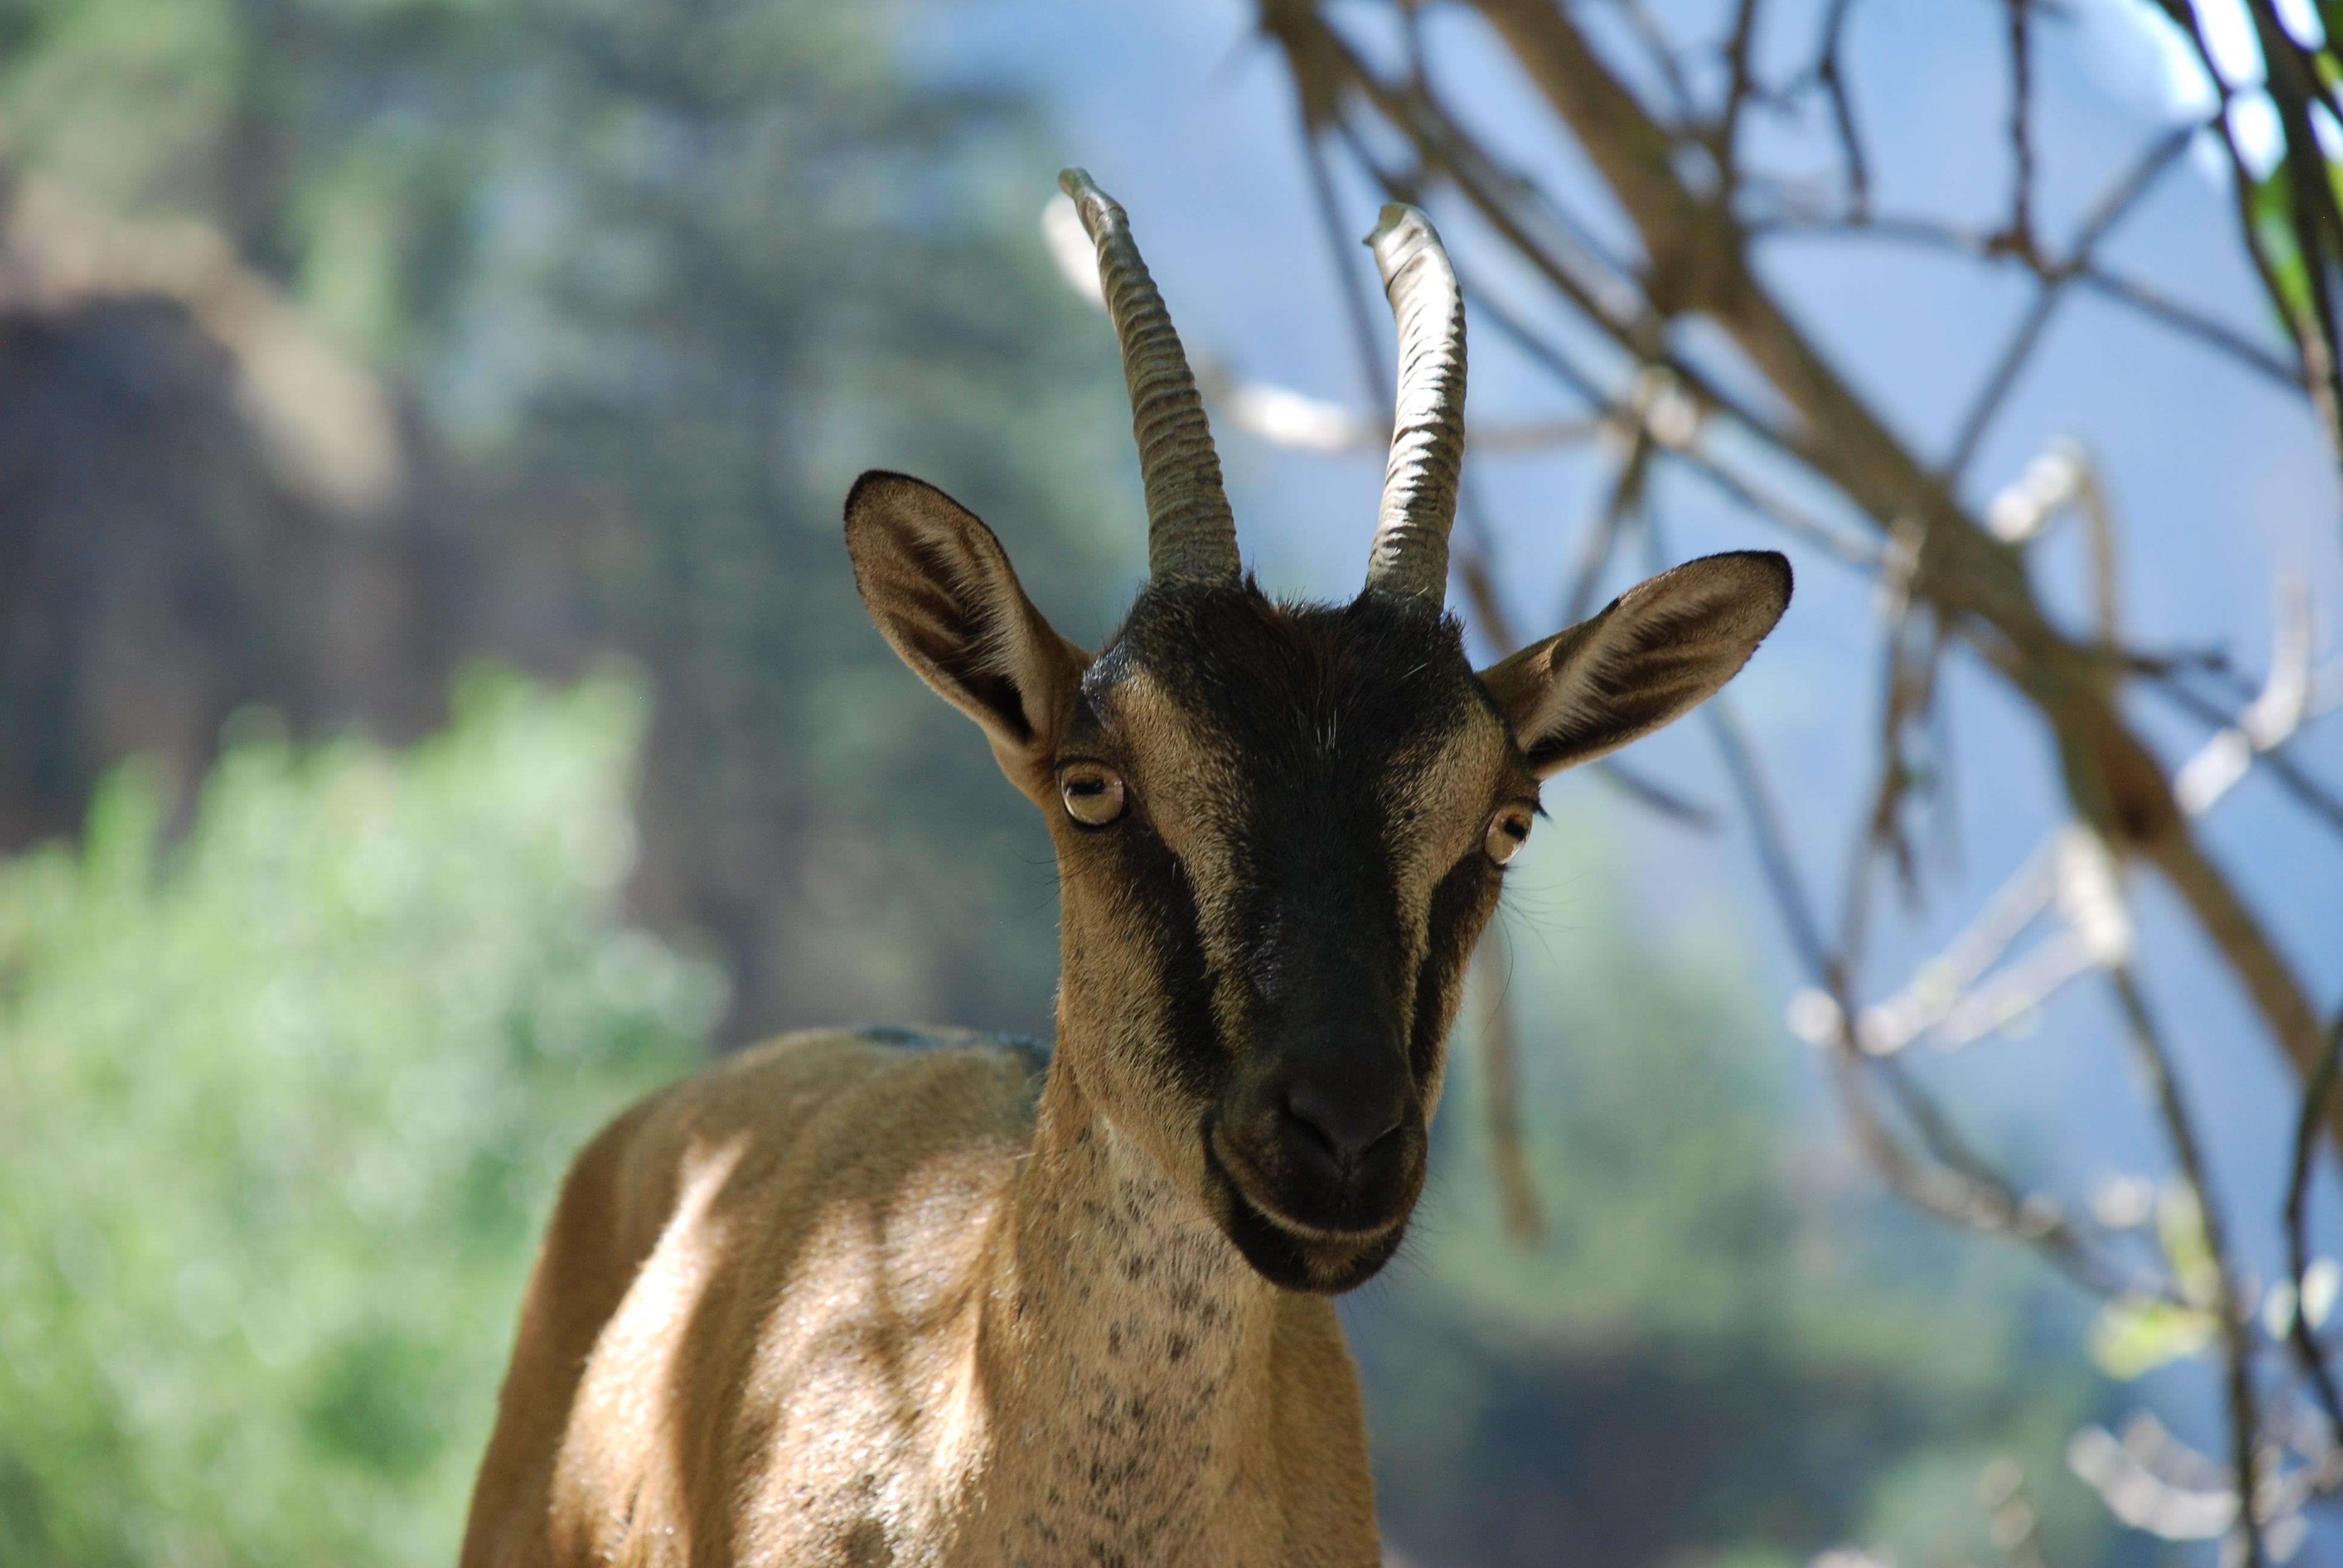 Cute Wallpapers Of All The Animals File Kri Kri Samaria Gorge Crete Jpg Wikimedia Commons